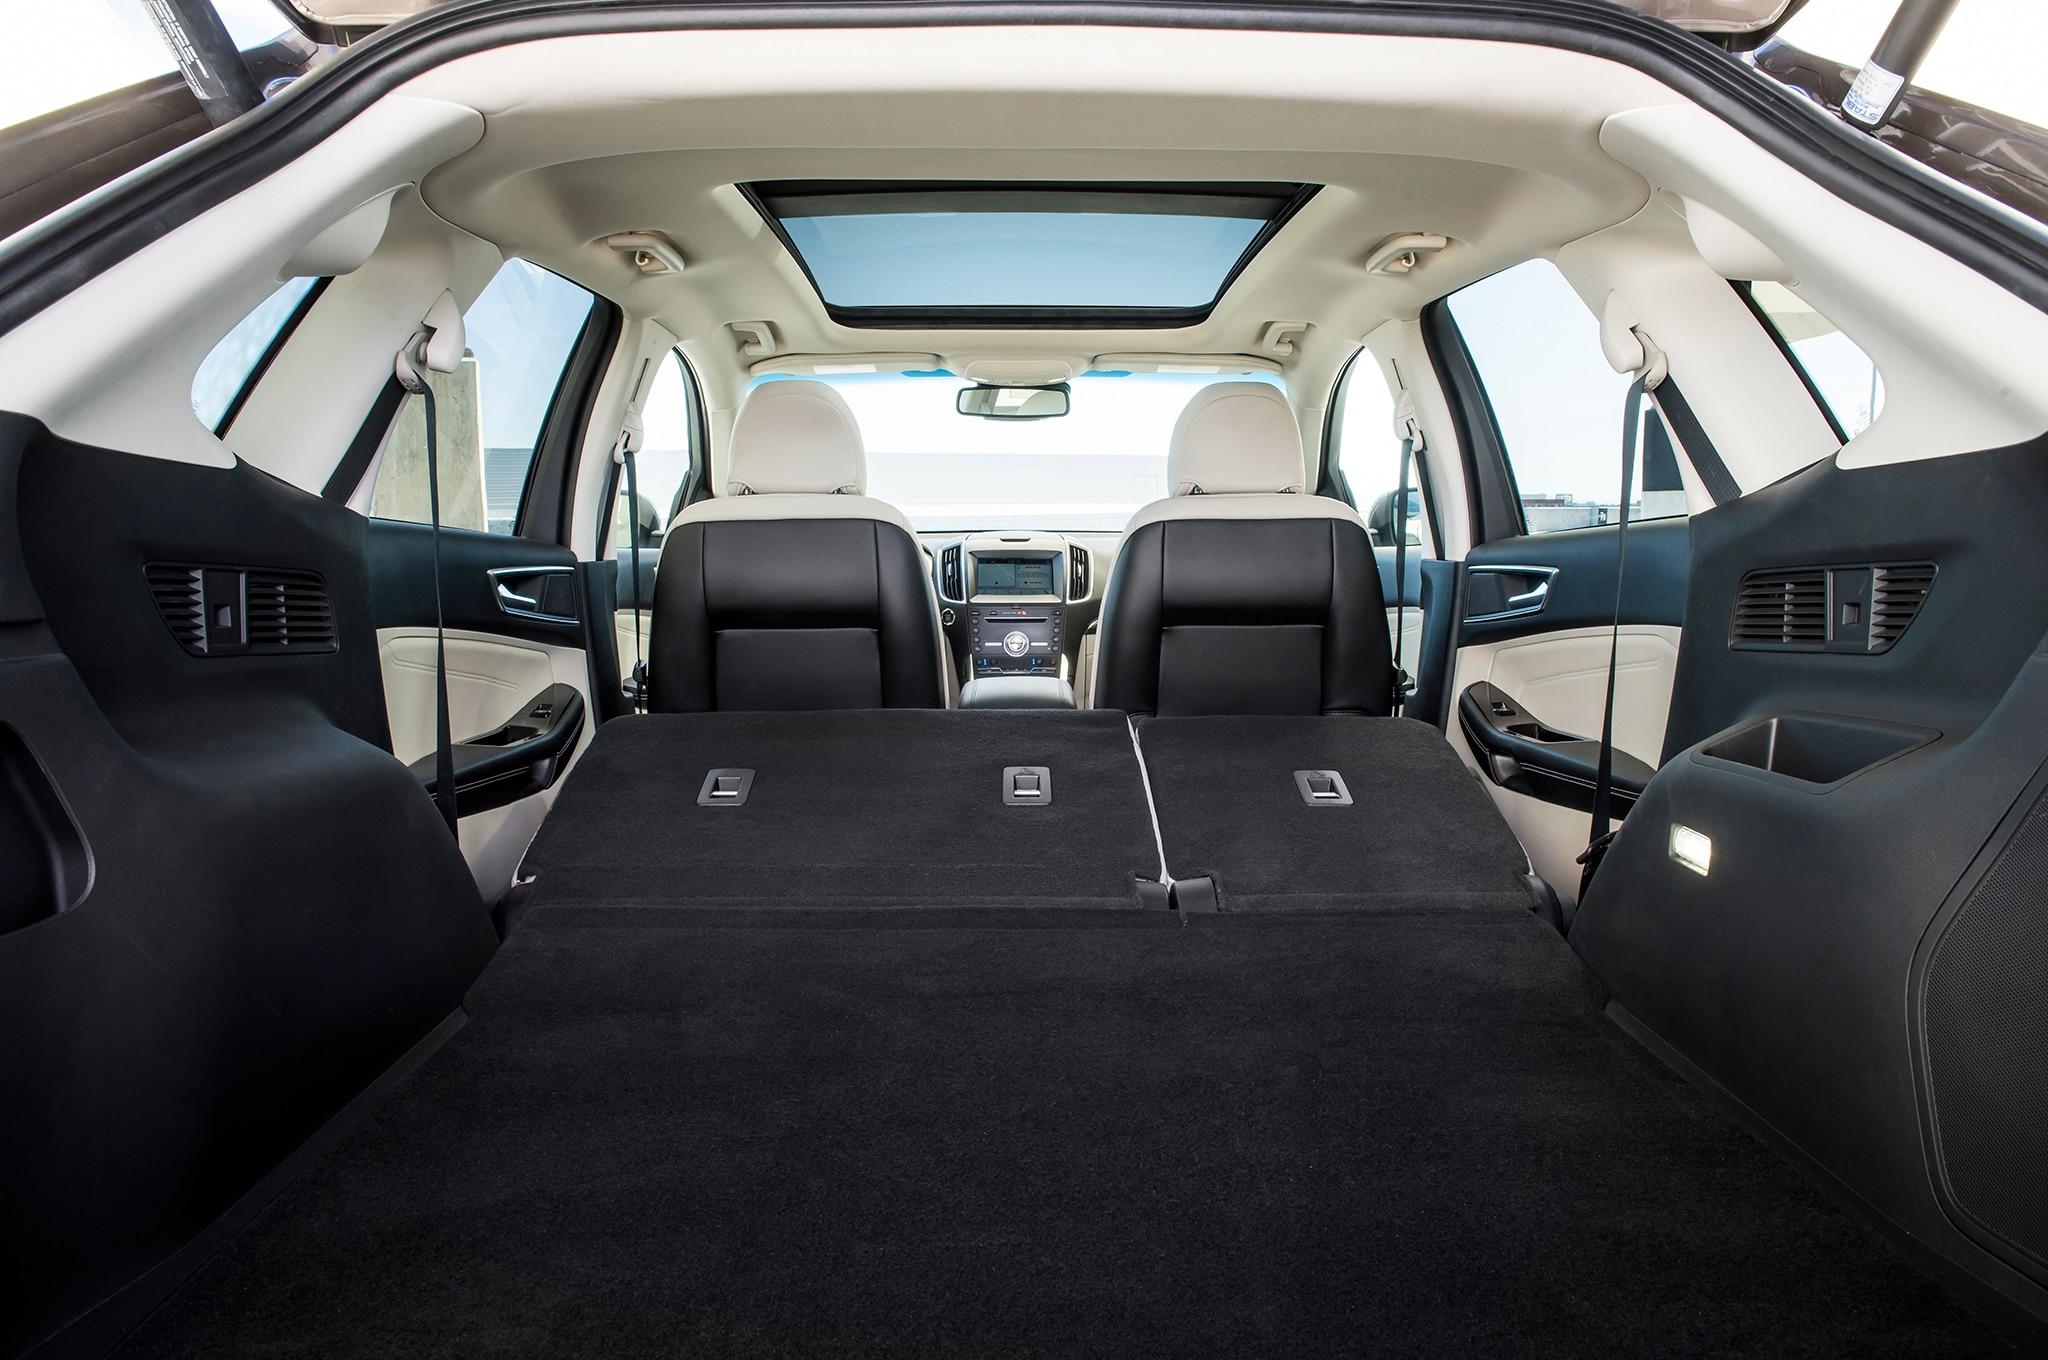 2019 Ford Edge Titanium Elite Package Debuts in Chicago | Automobile Magazine